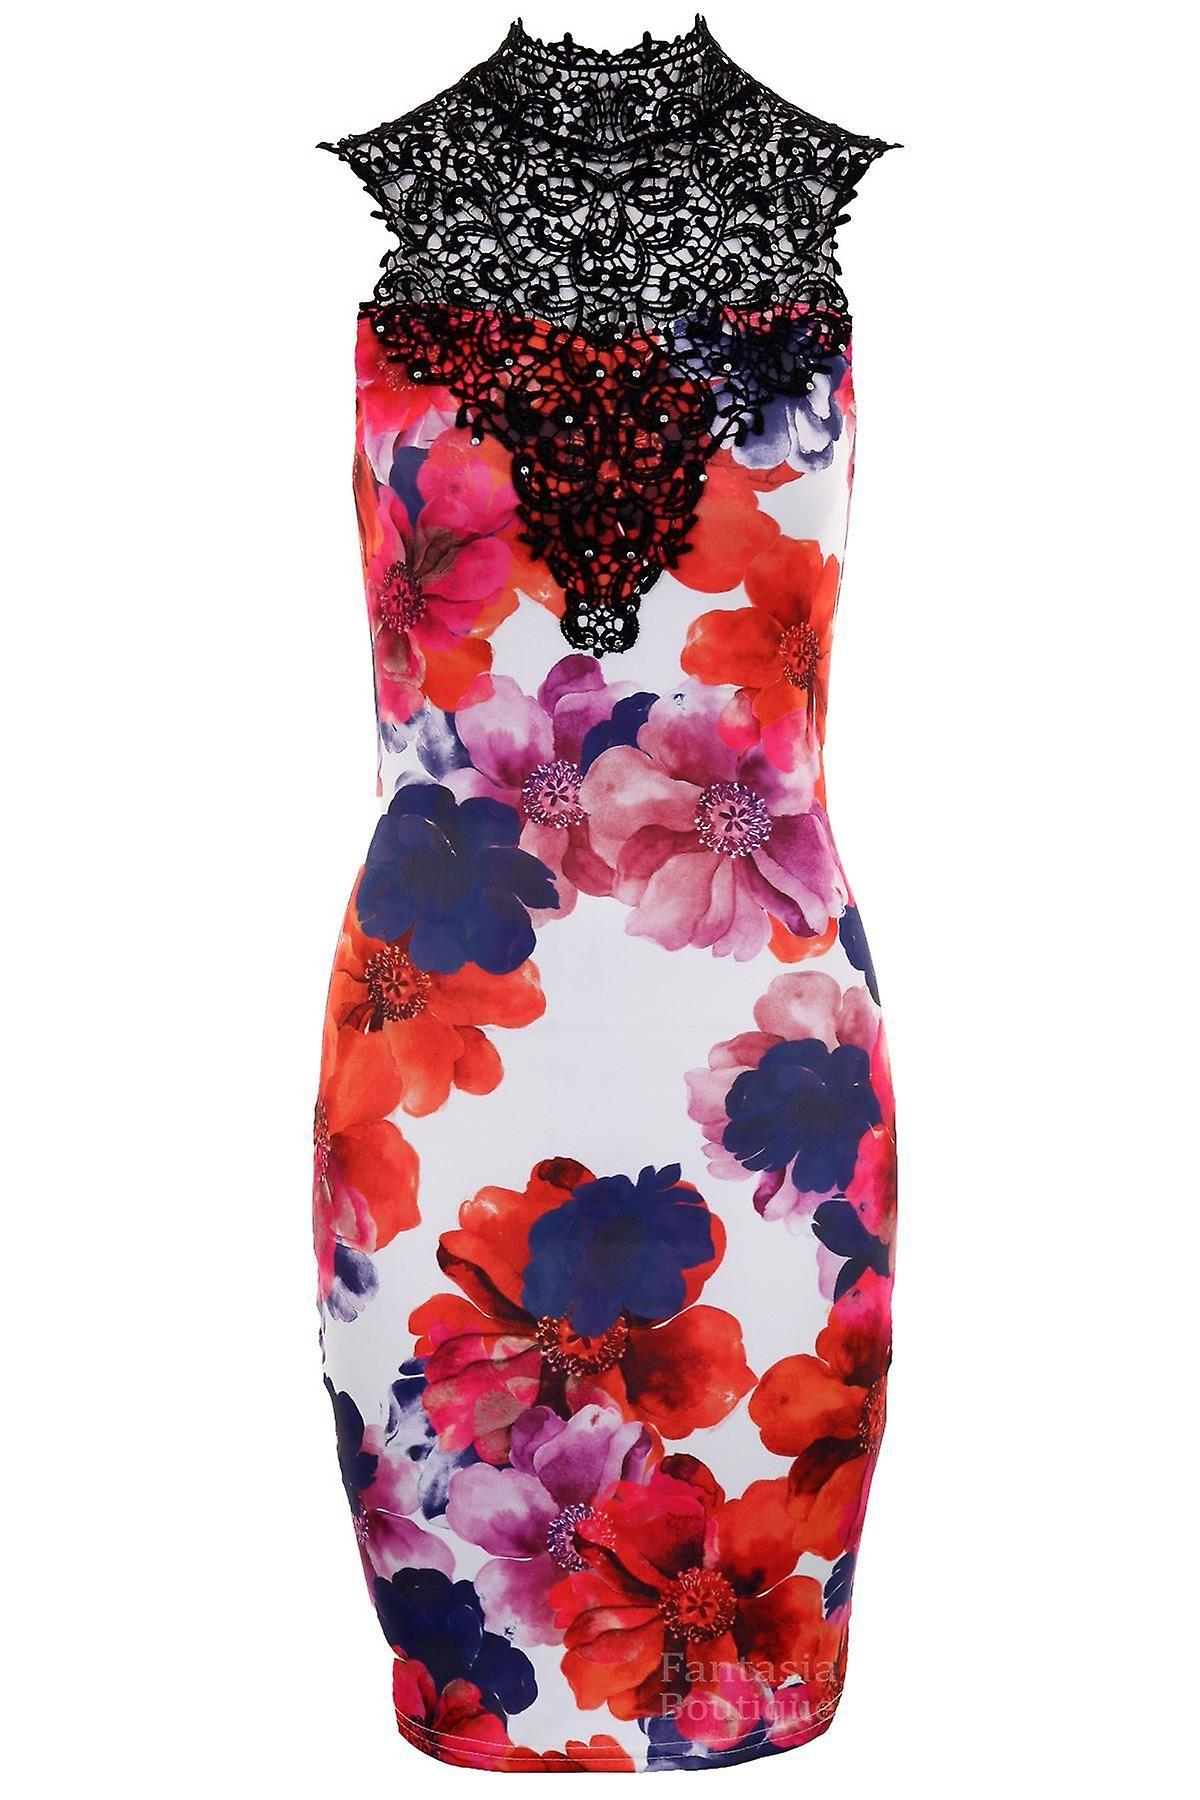 Ladies Floral Print Crochet Neck Sleeveless Evening Party Bodycon Women's Dress